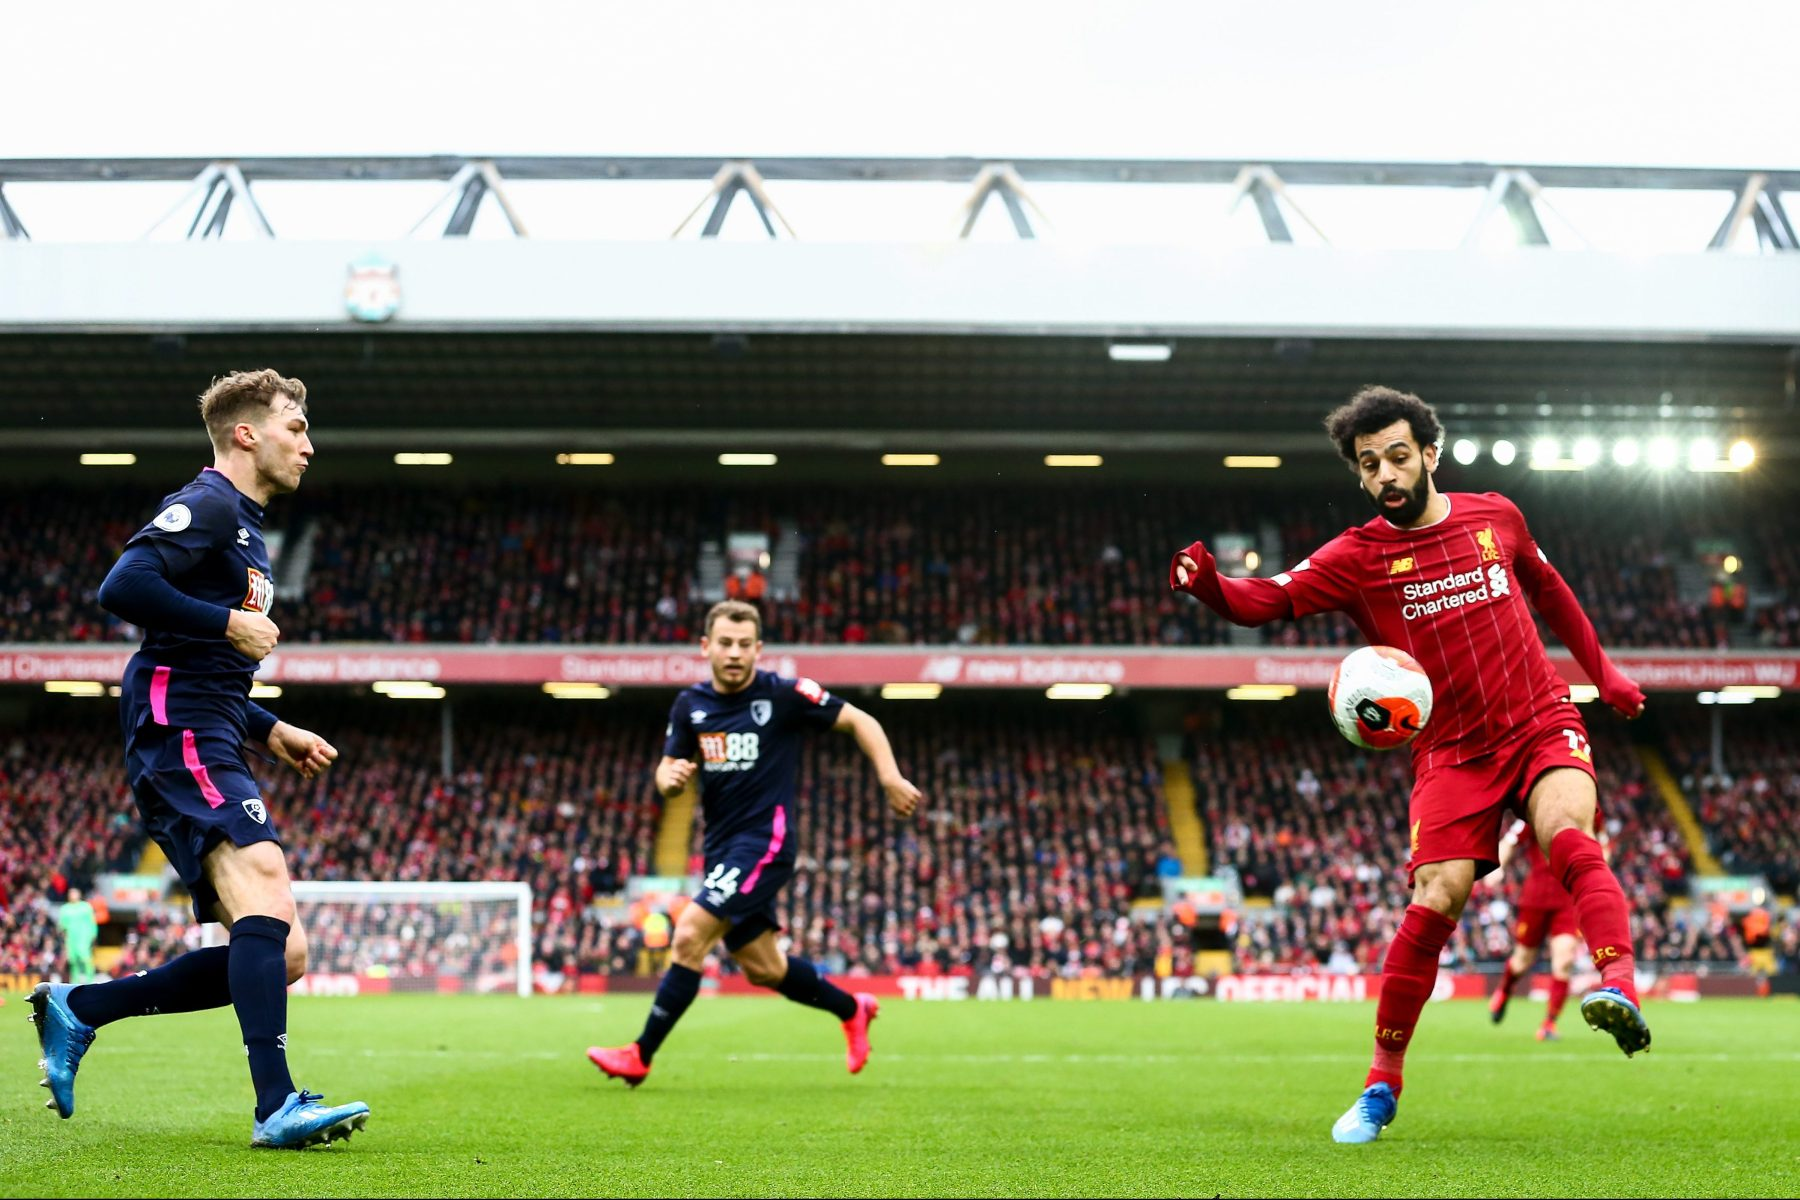 Mo Salah corrals a ball against AFC Bournemouth